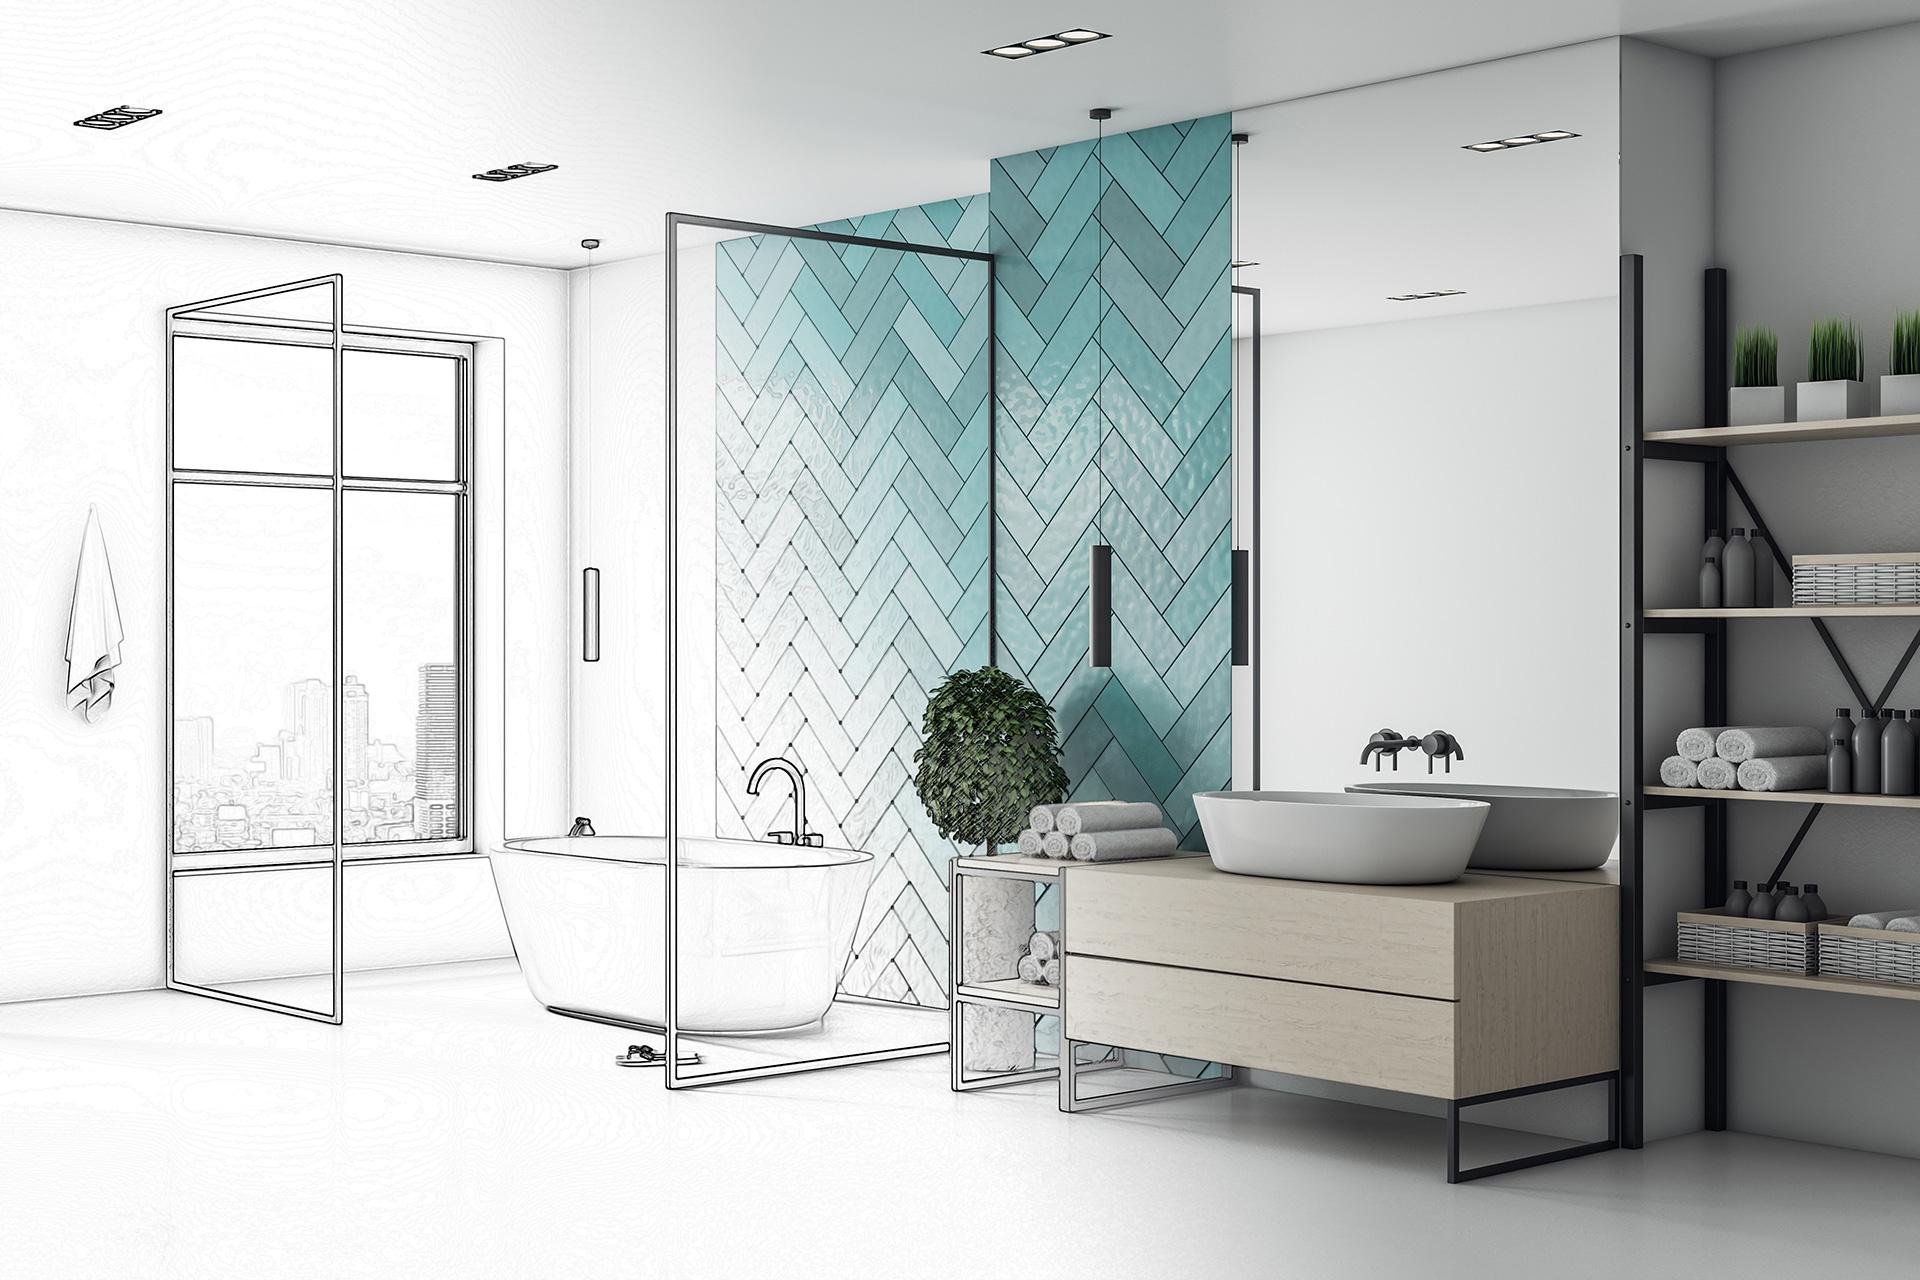 https://von-adelberg.com/wp-content/uploads/2021/01/bathroom-concept-4.jpg